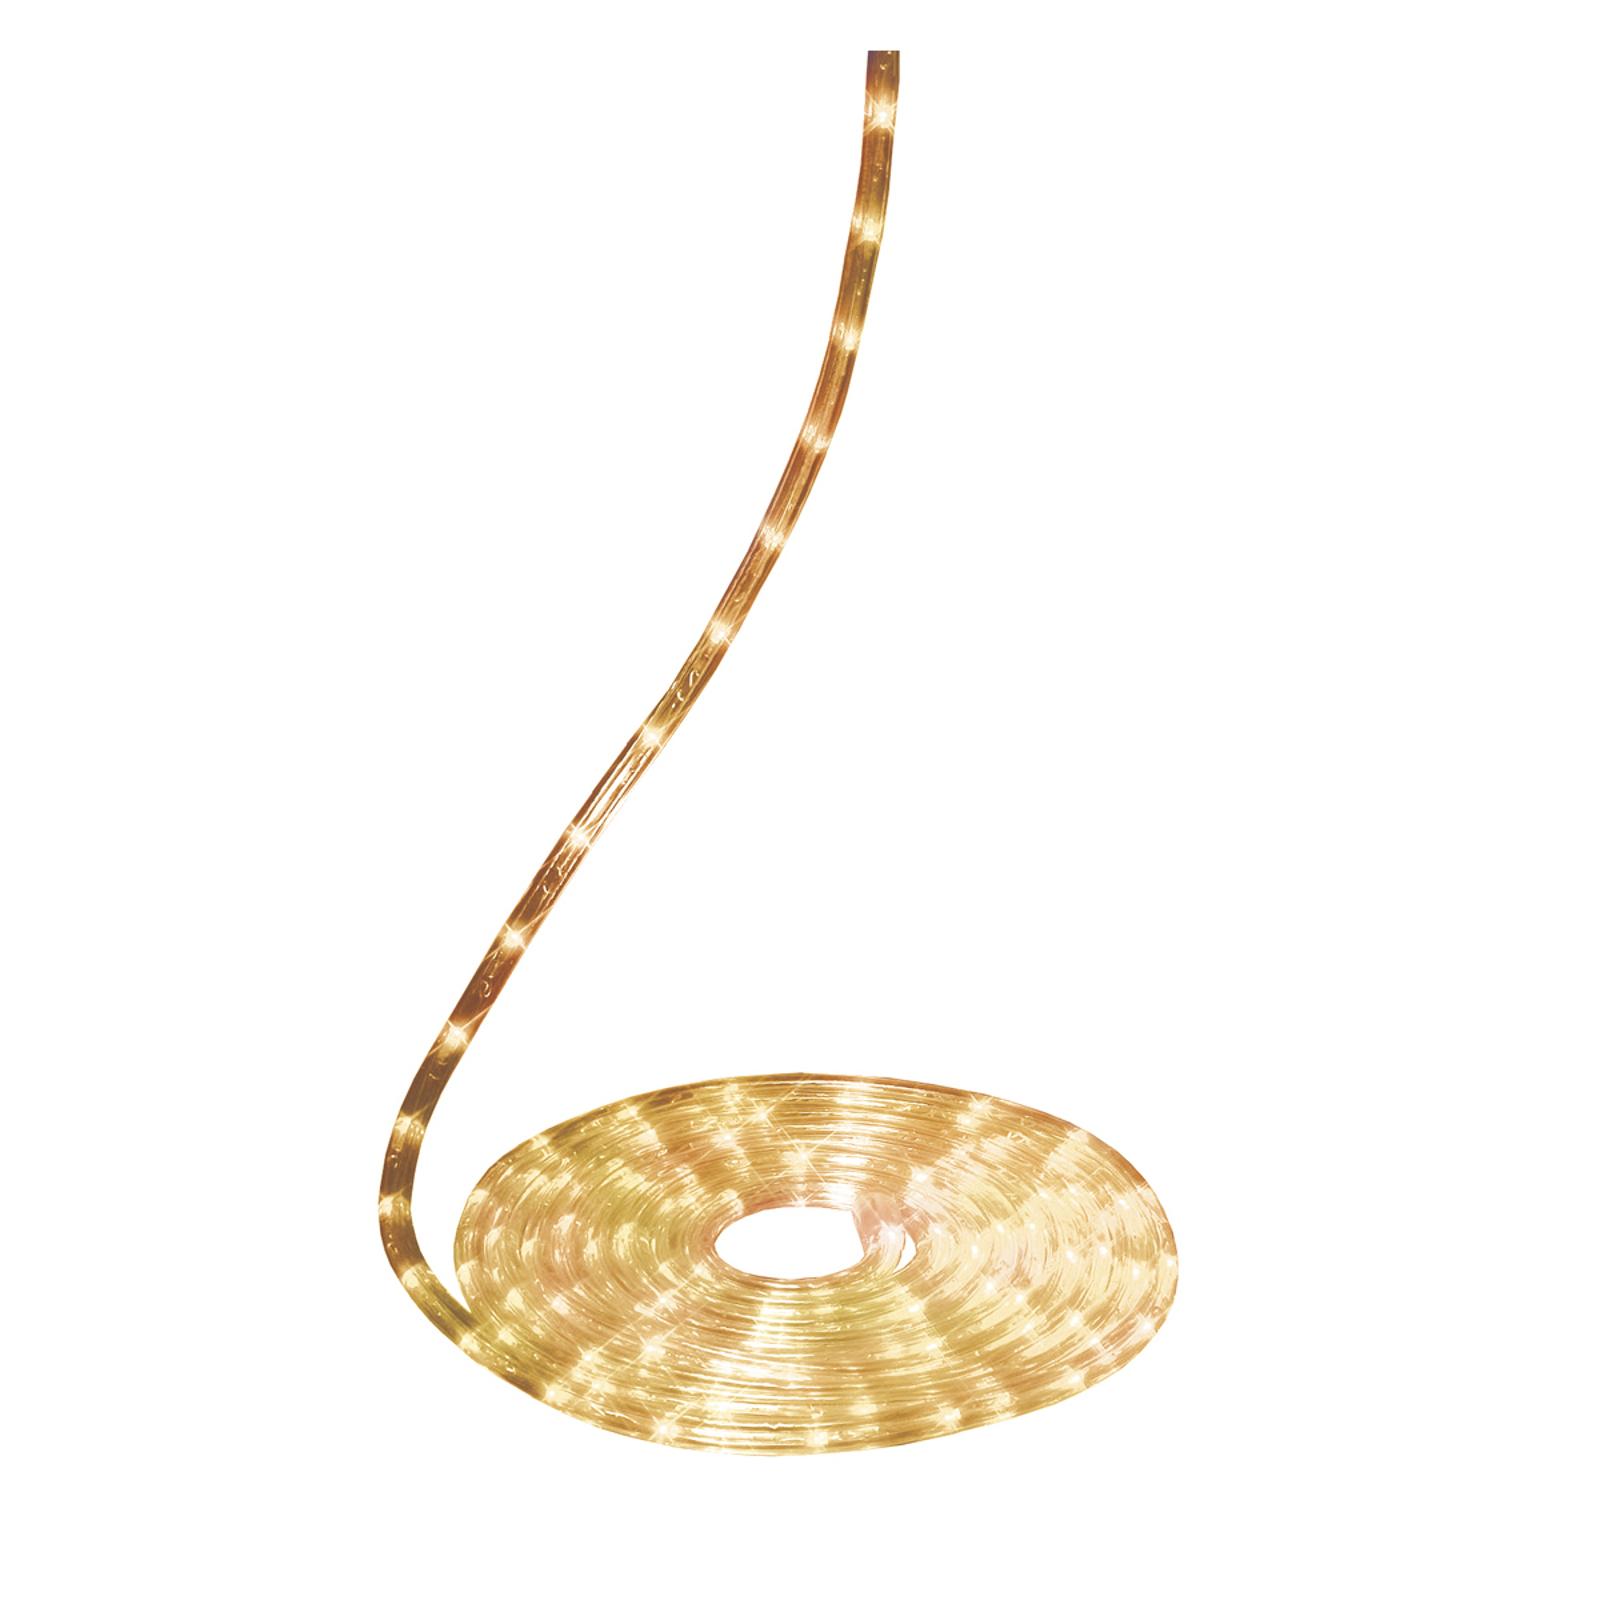 Micro-Lichtschlauch Ropelight 6 Meter klar